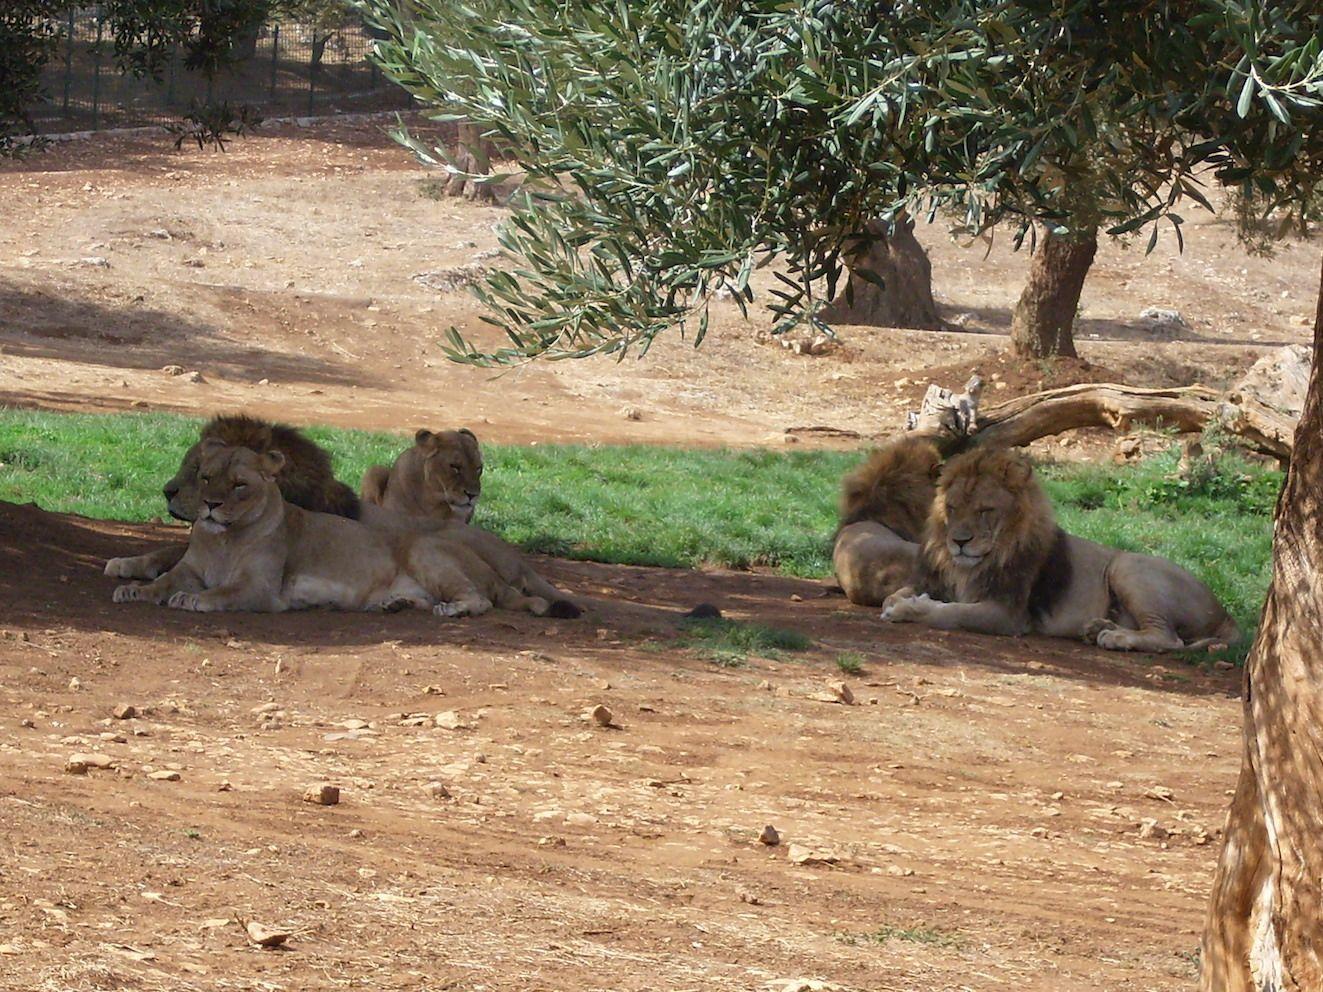 Lions at the zoo safari of Fasano | Viaggi